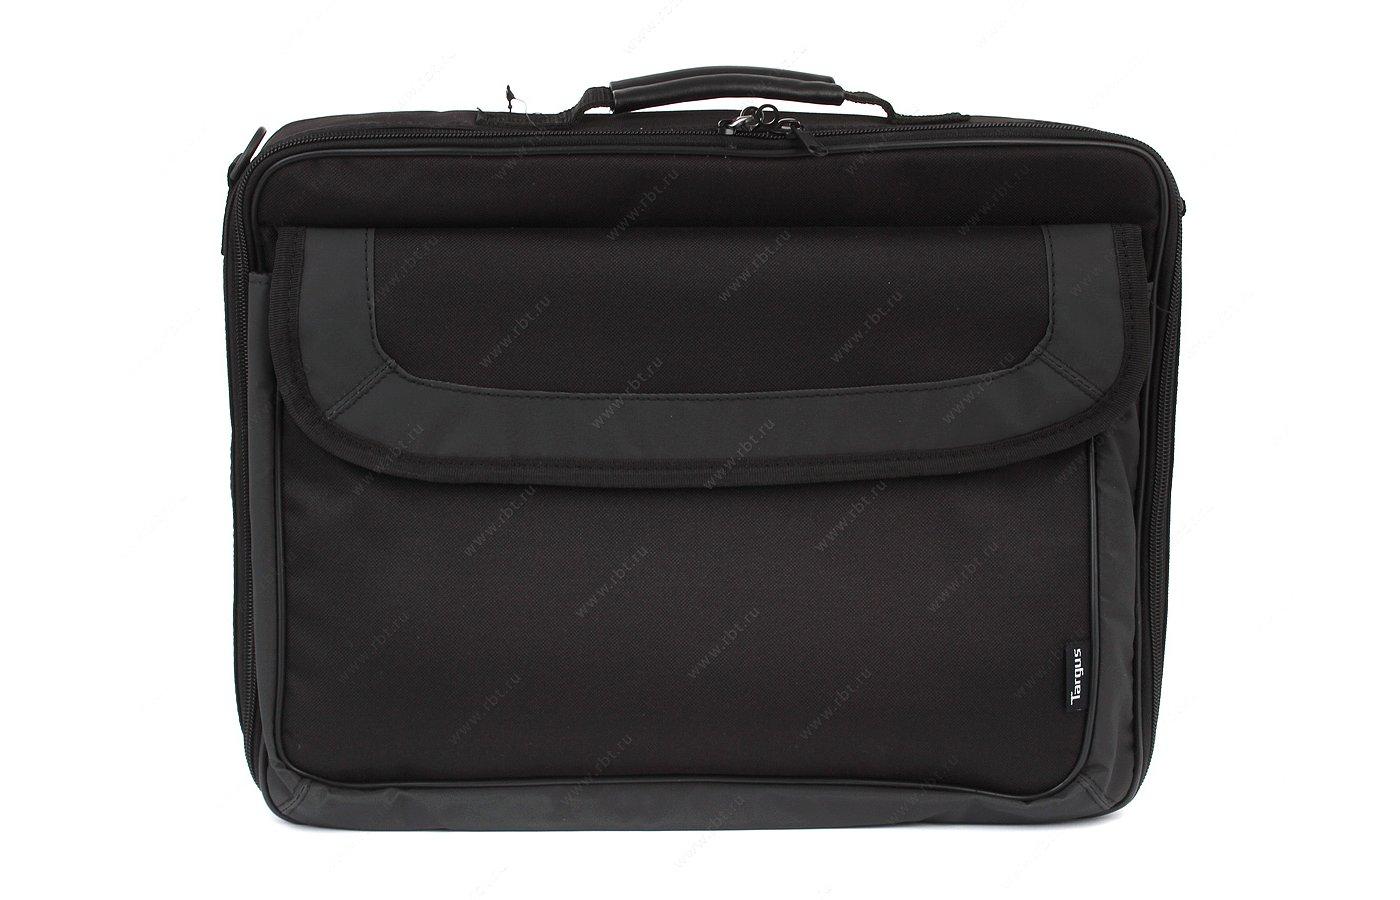 Кейс для ноутбука Targus TAR300 чёрный нейлон (385x300x45)